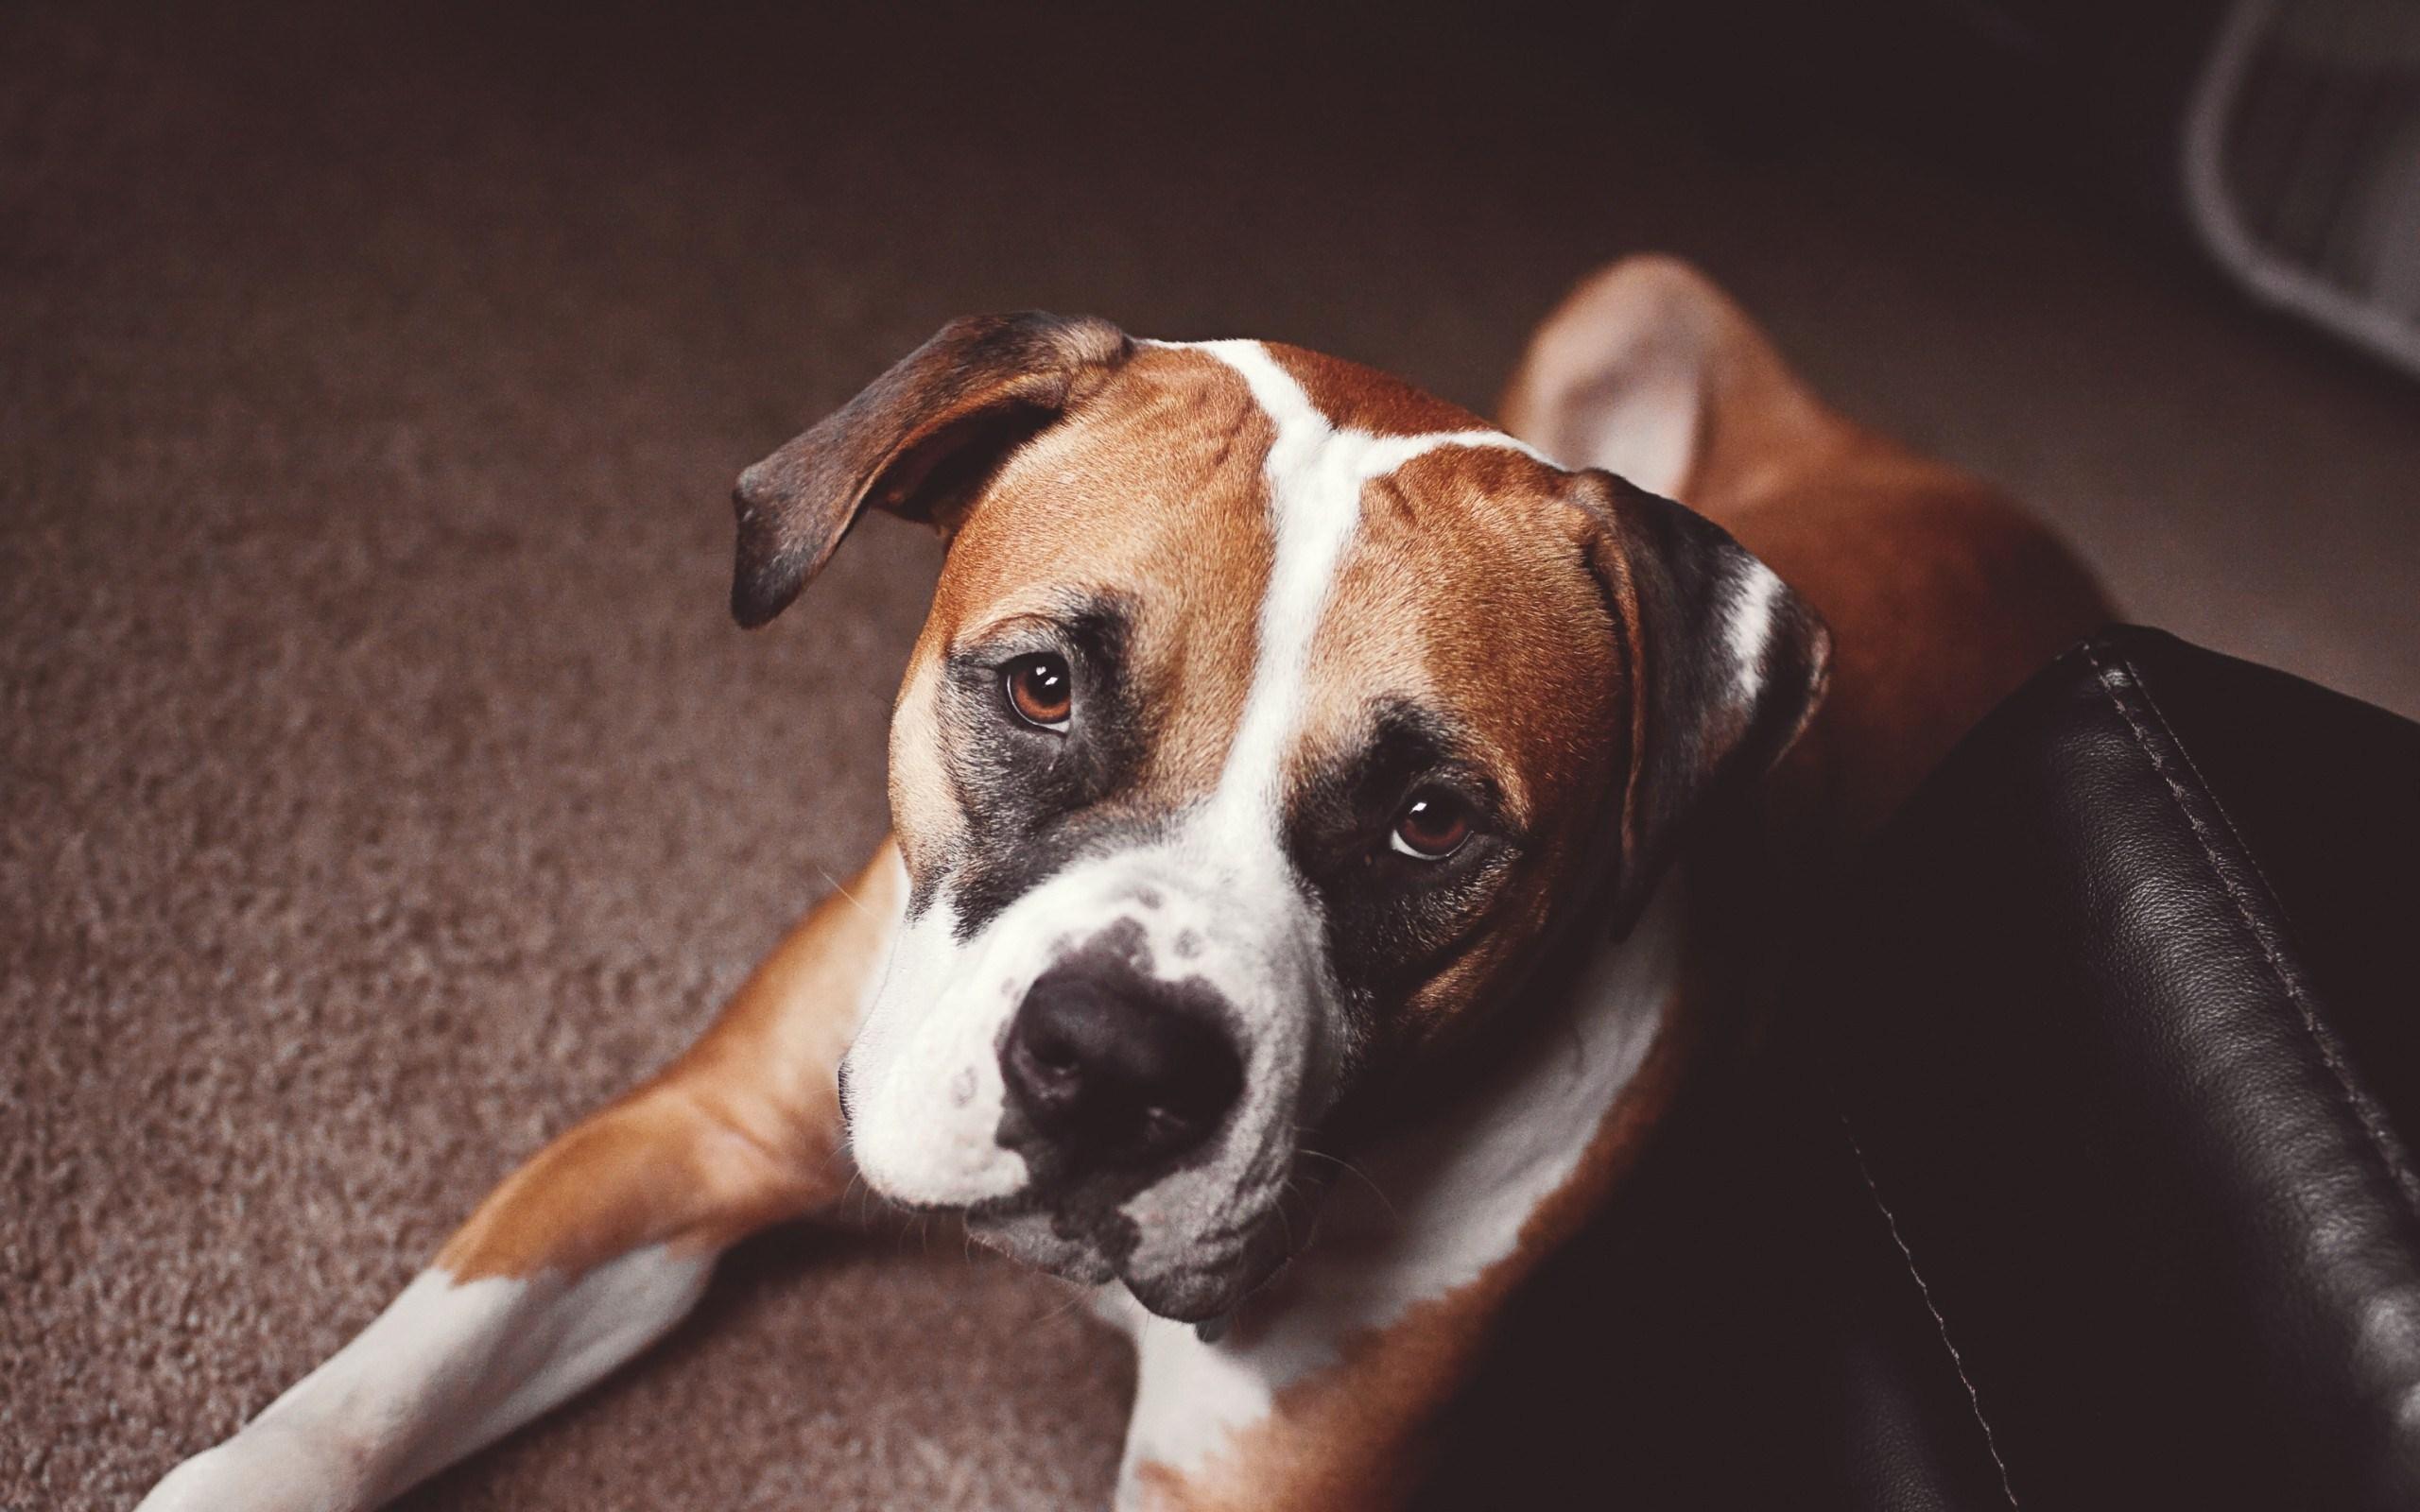 dogs photos hd